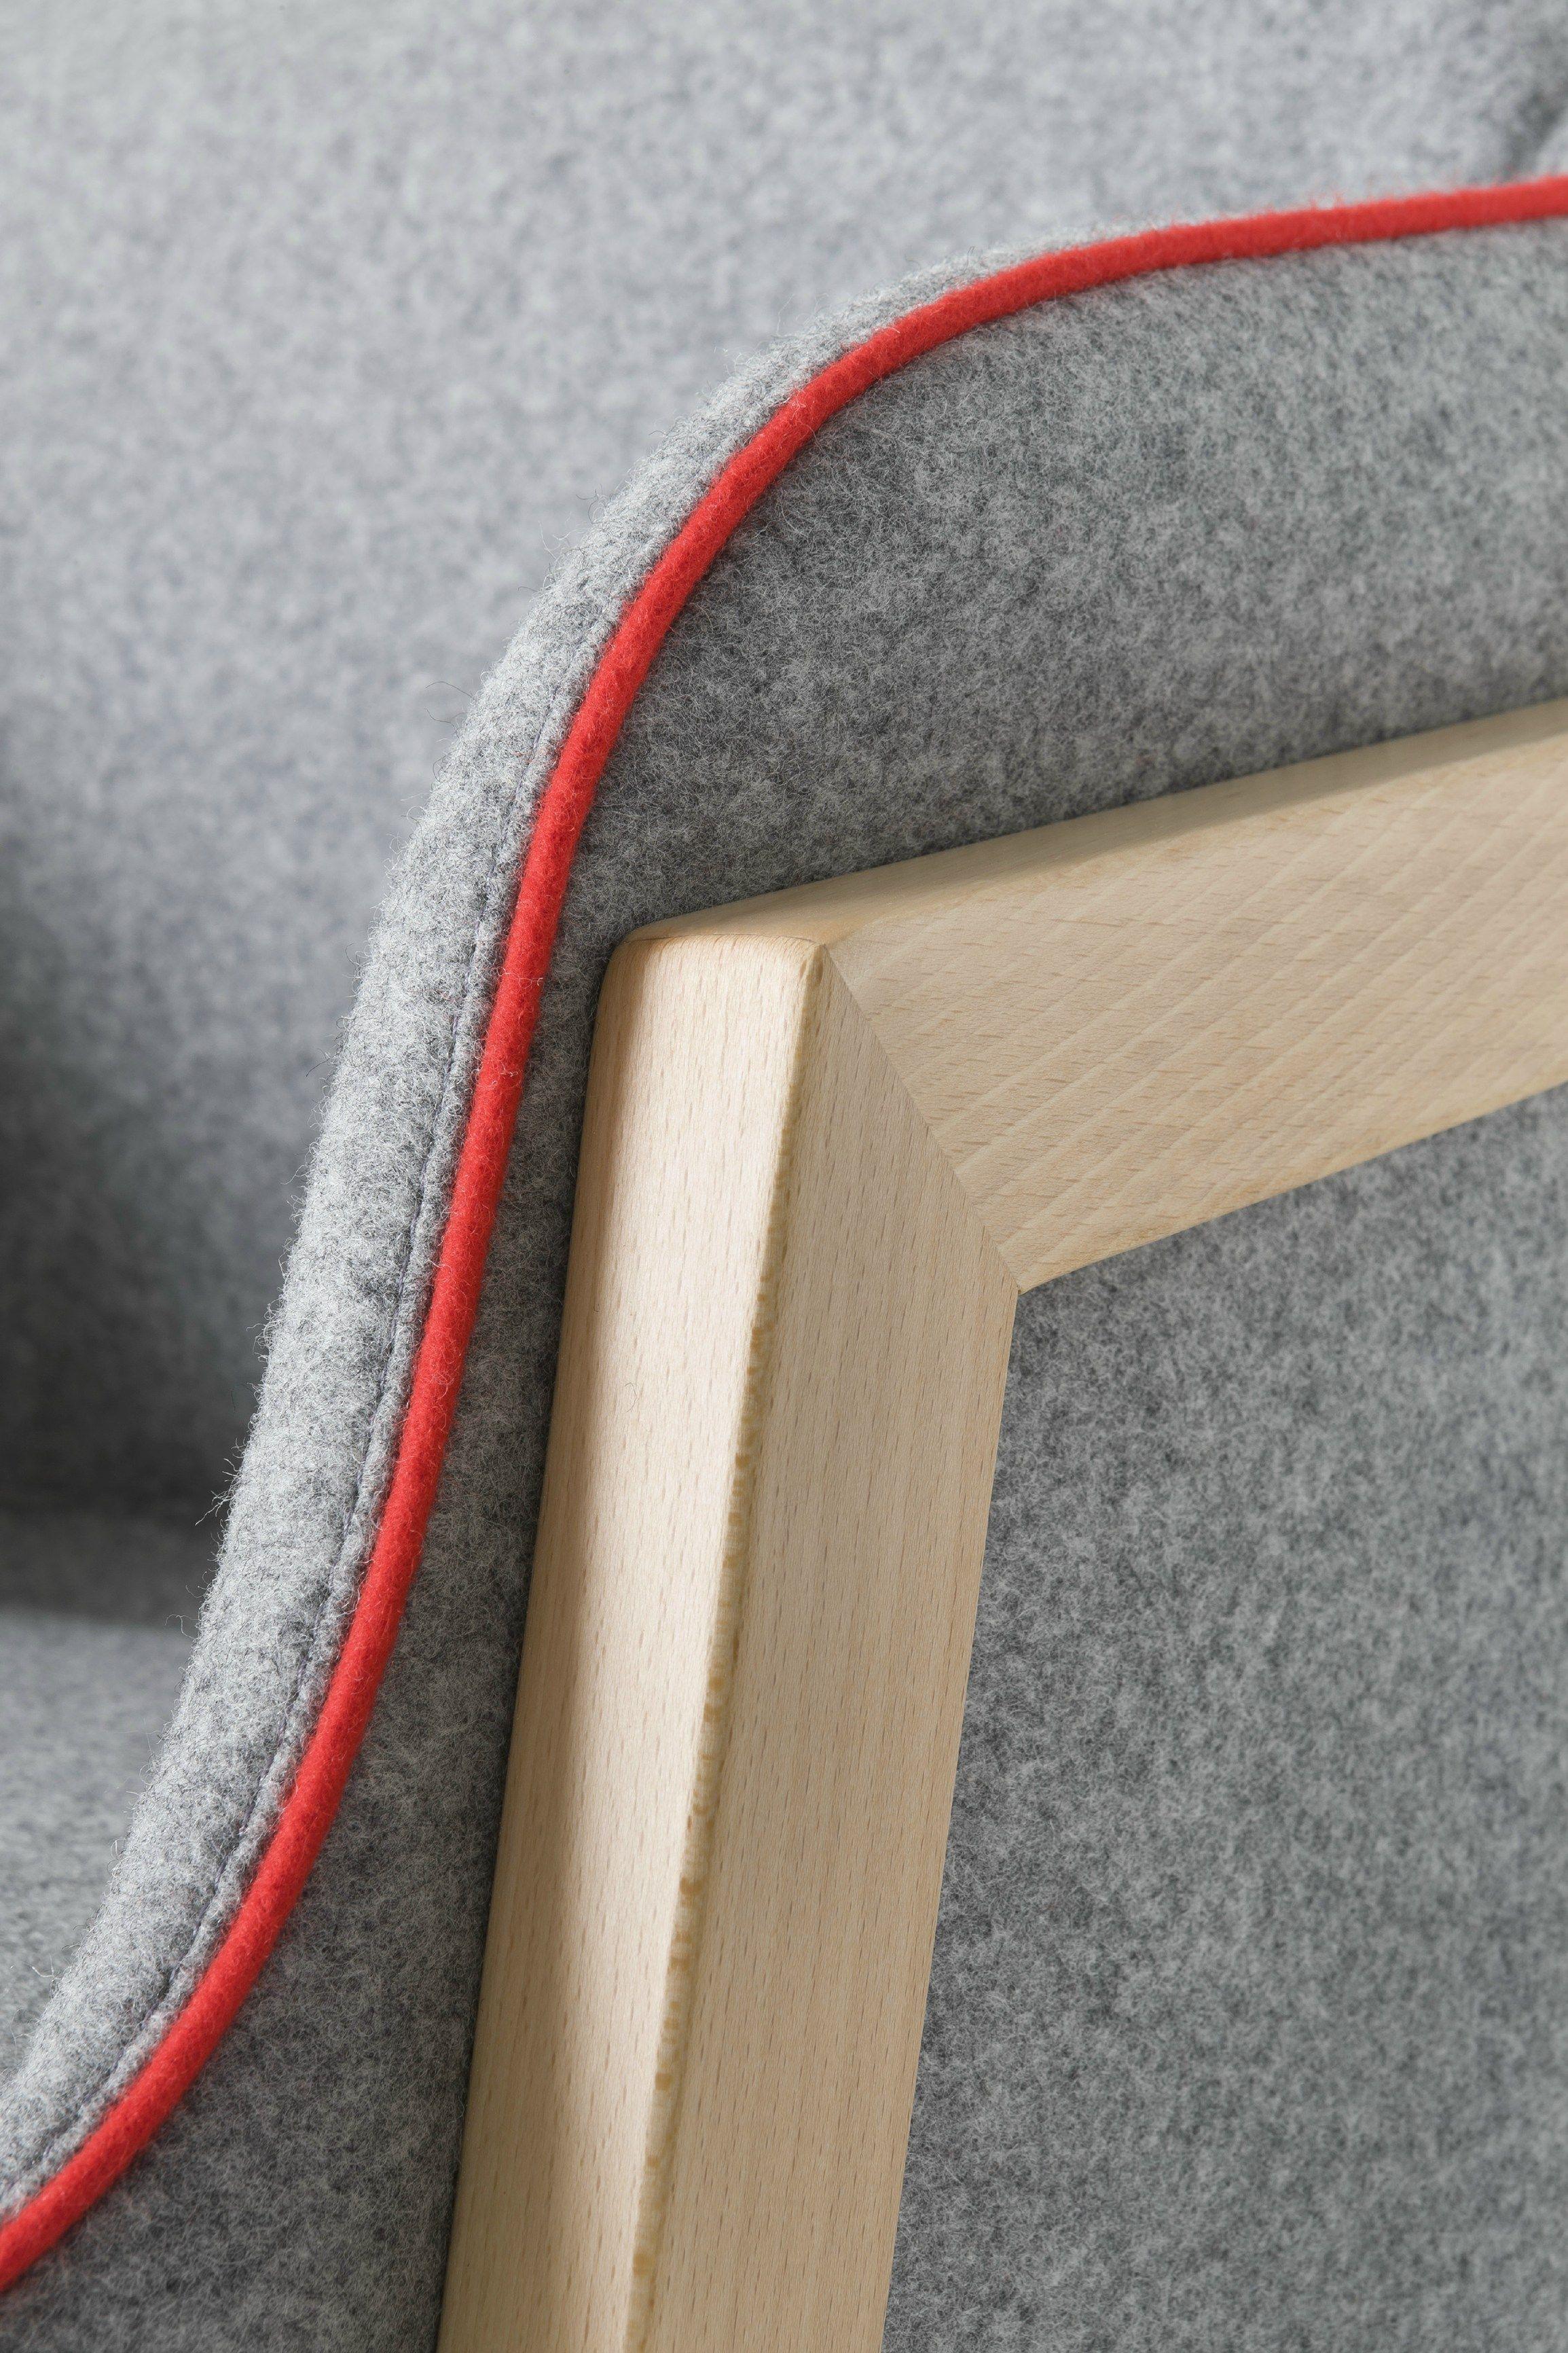 #chair #details